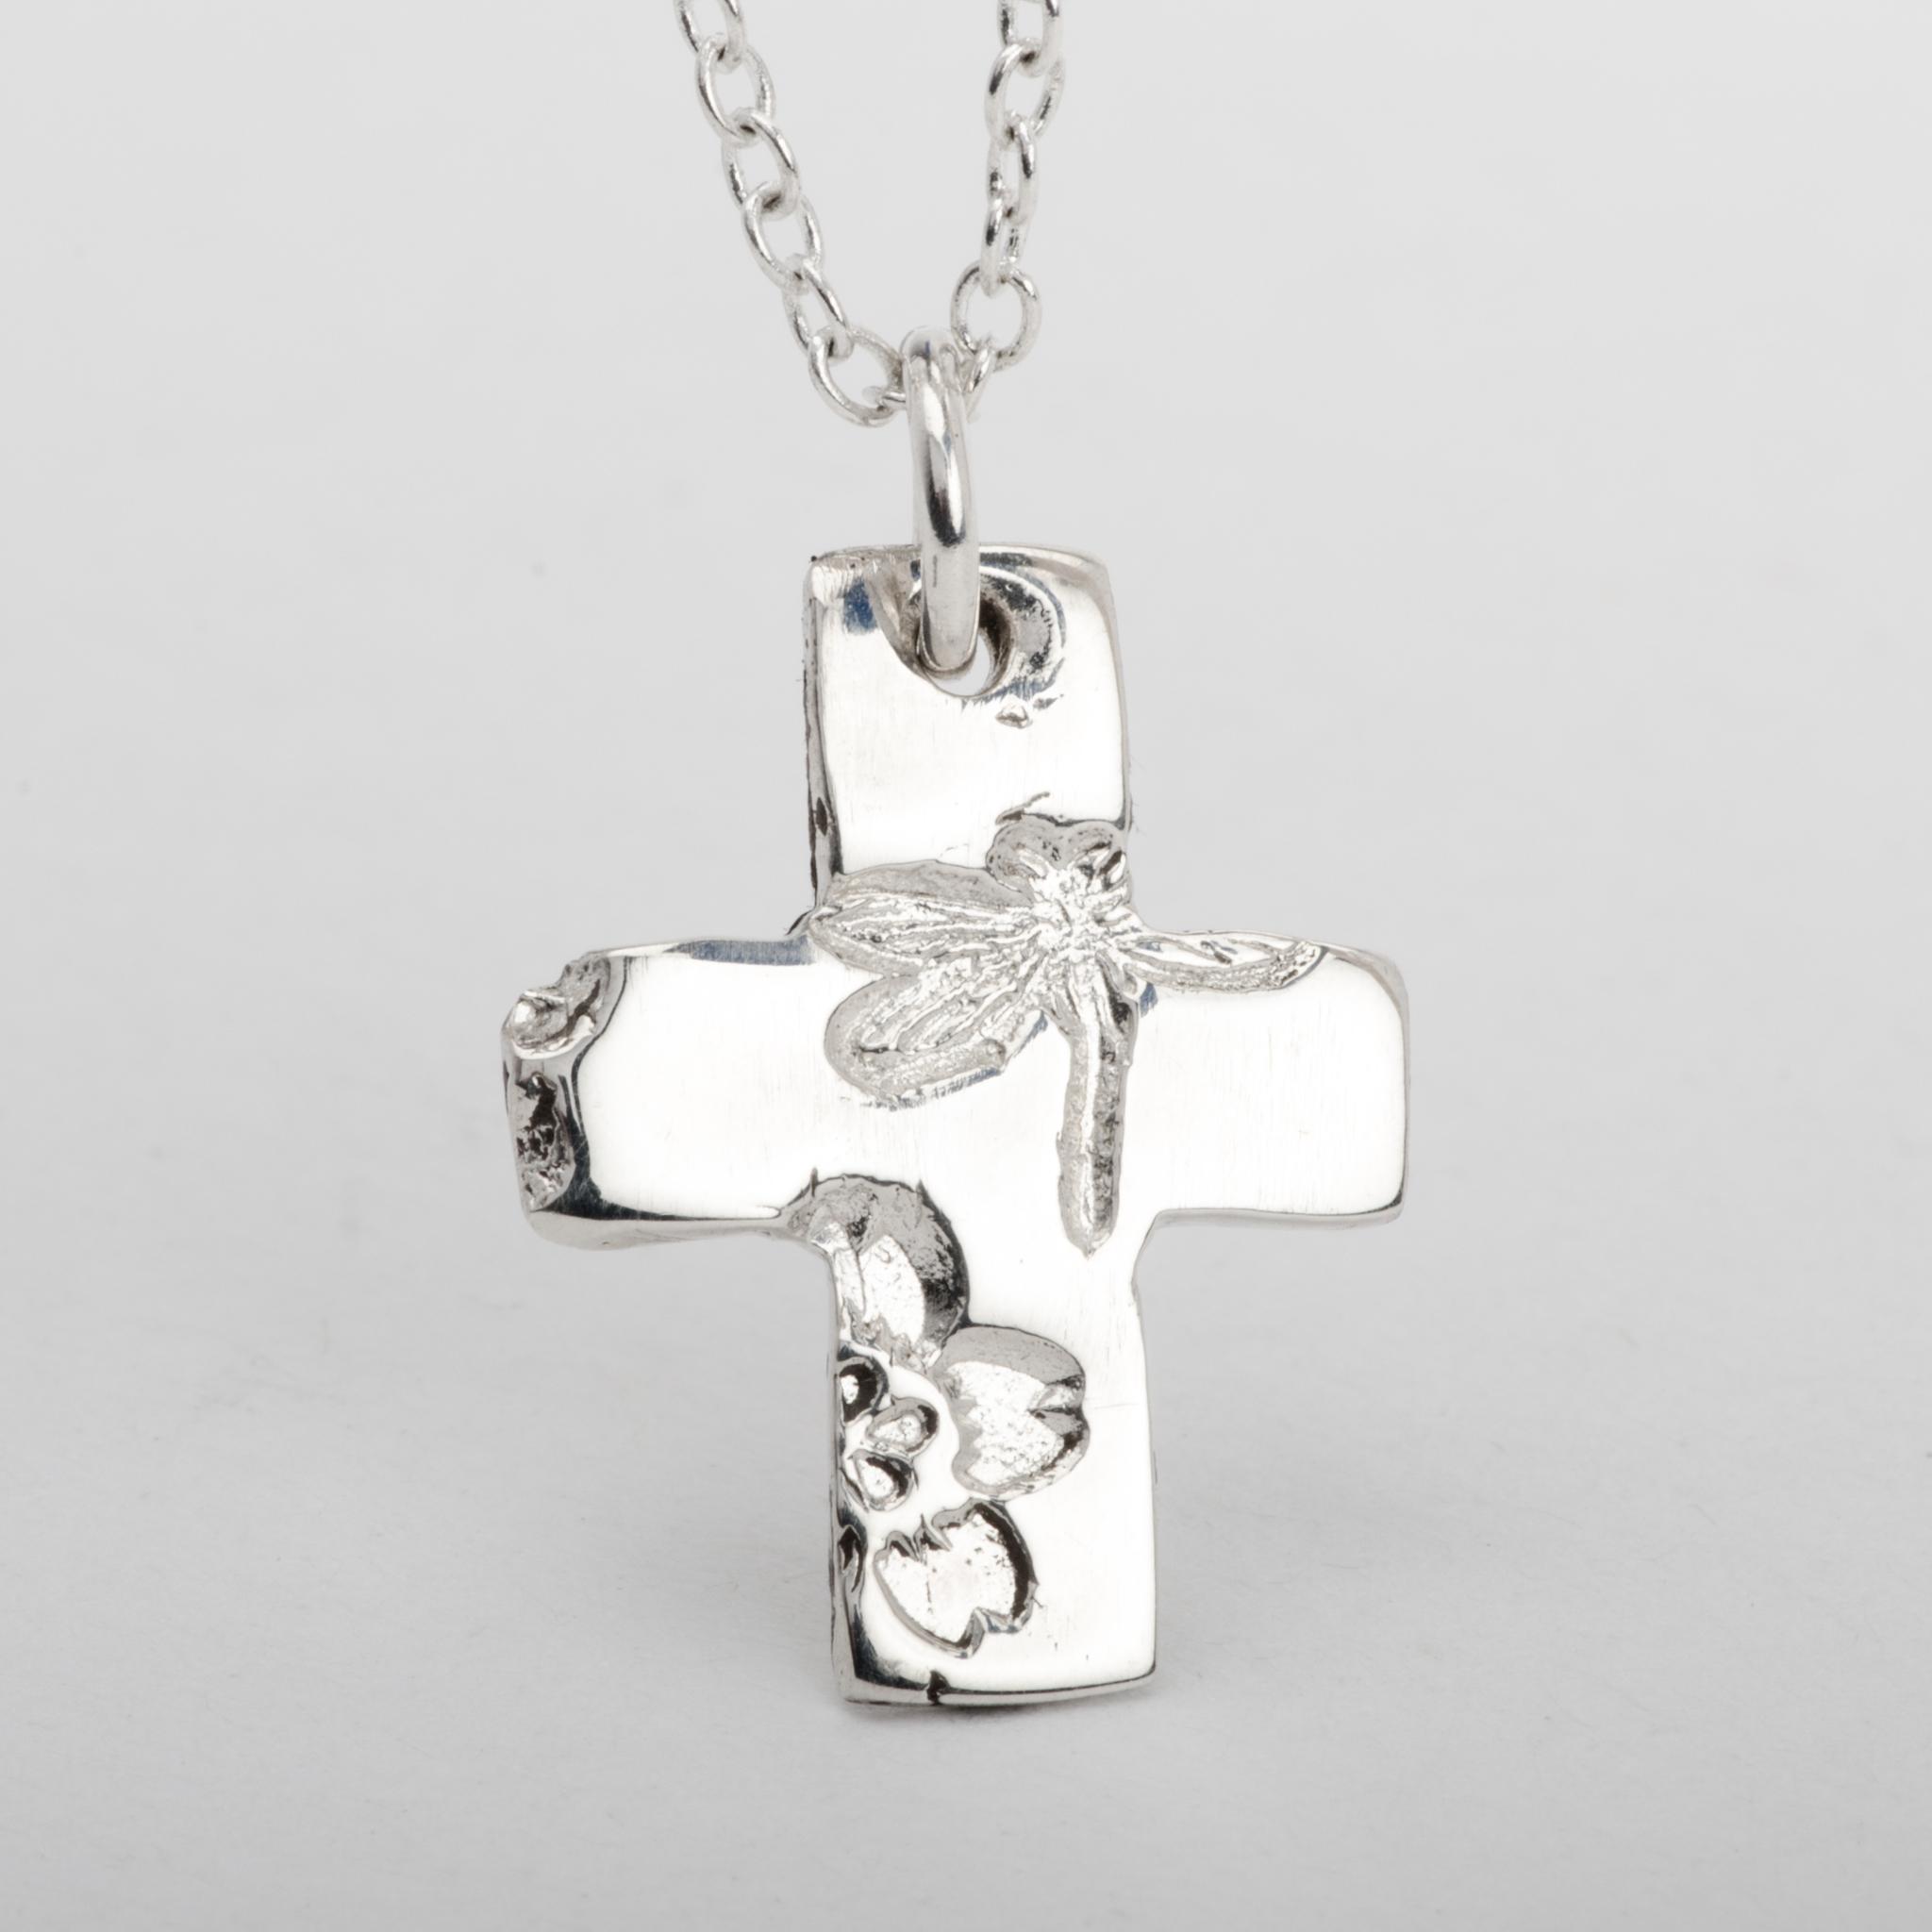 Cross Pendant Necklace Dragonfly Flower Sterling Silver Women Jewelry